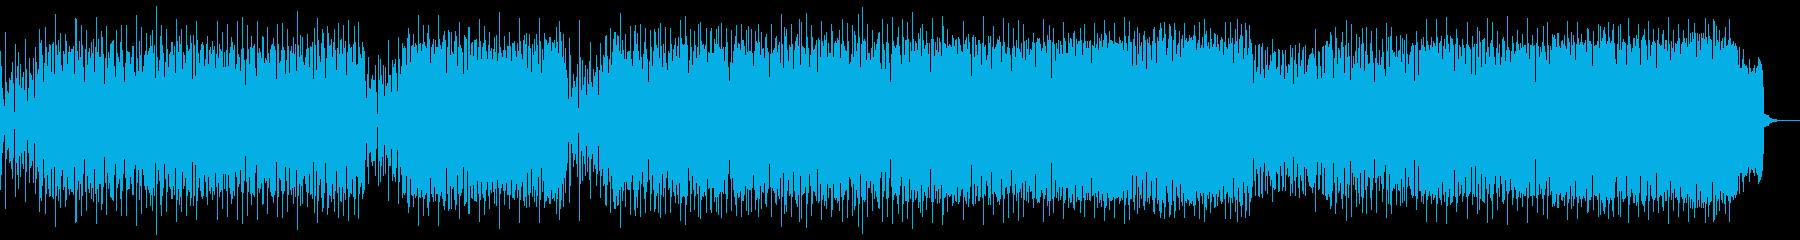 UPHILL CLIMBコンペティ...の再生済みの波形